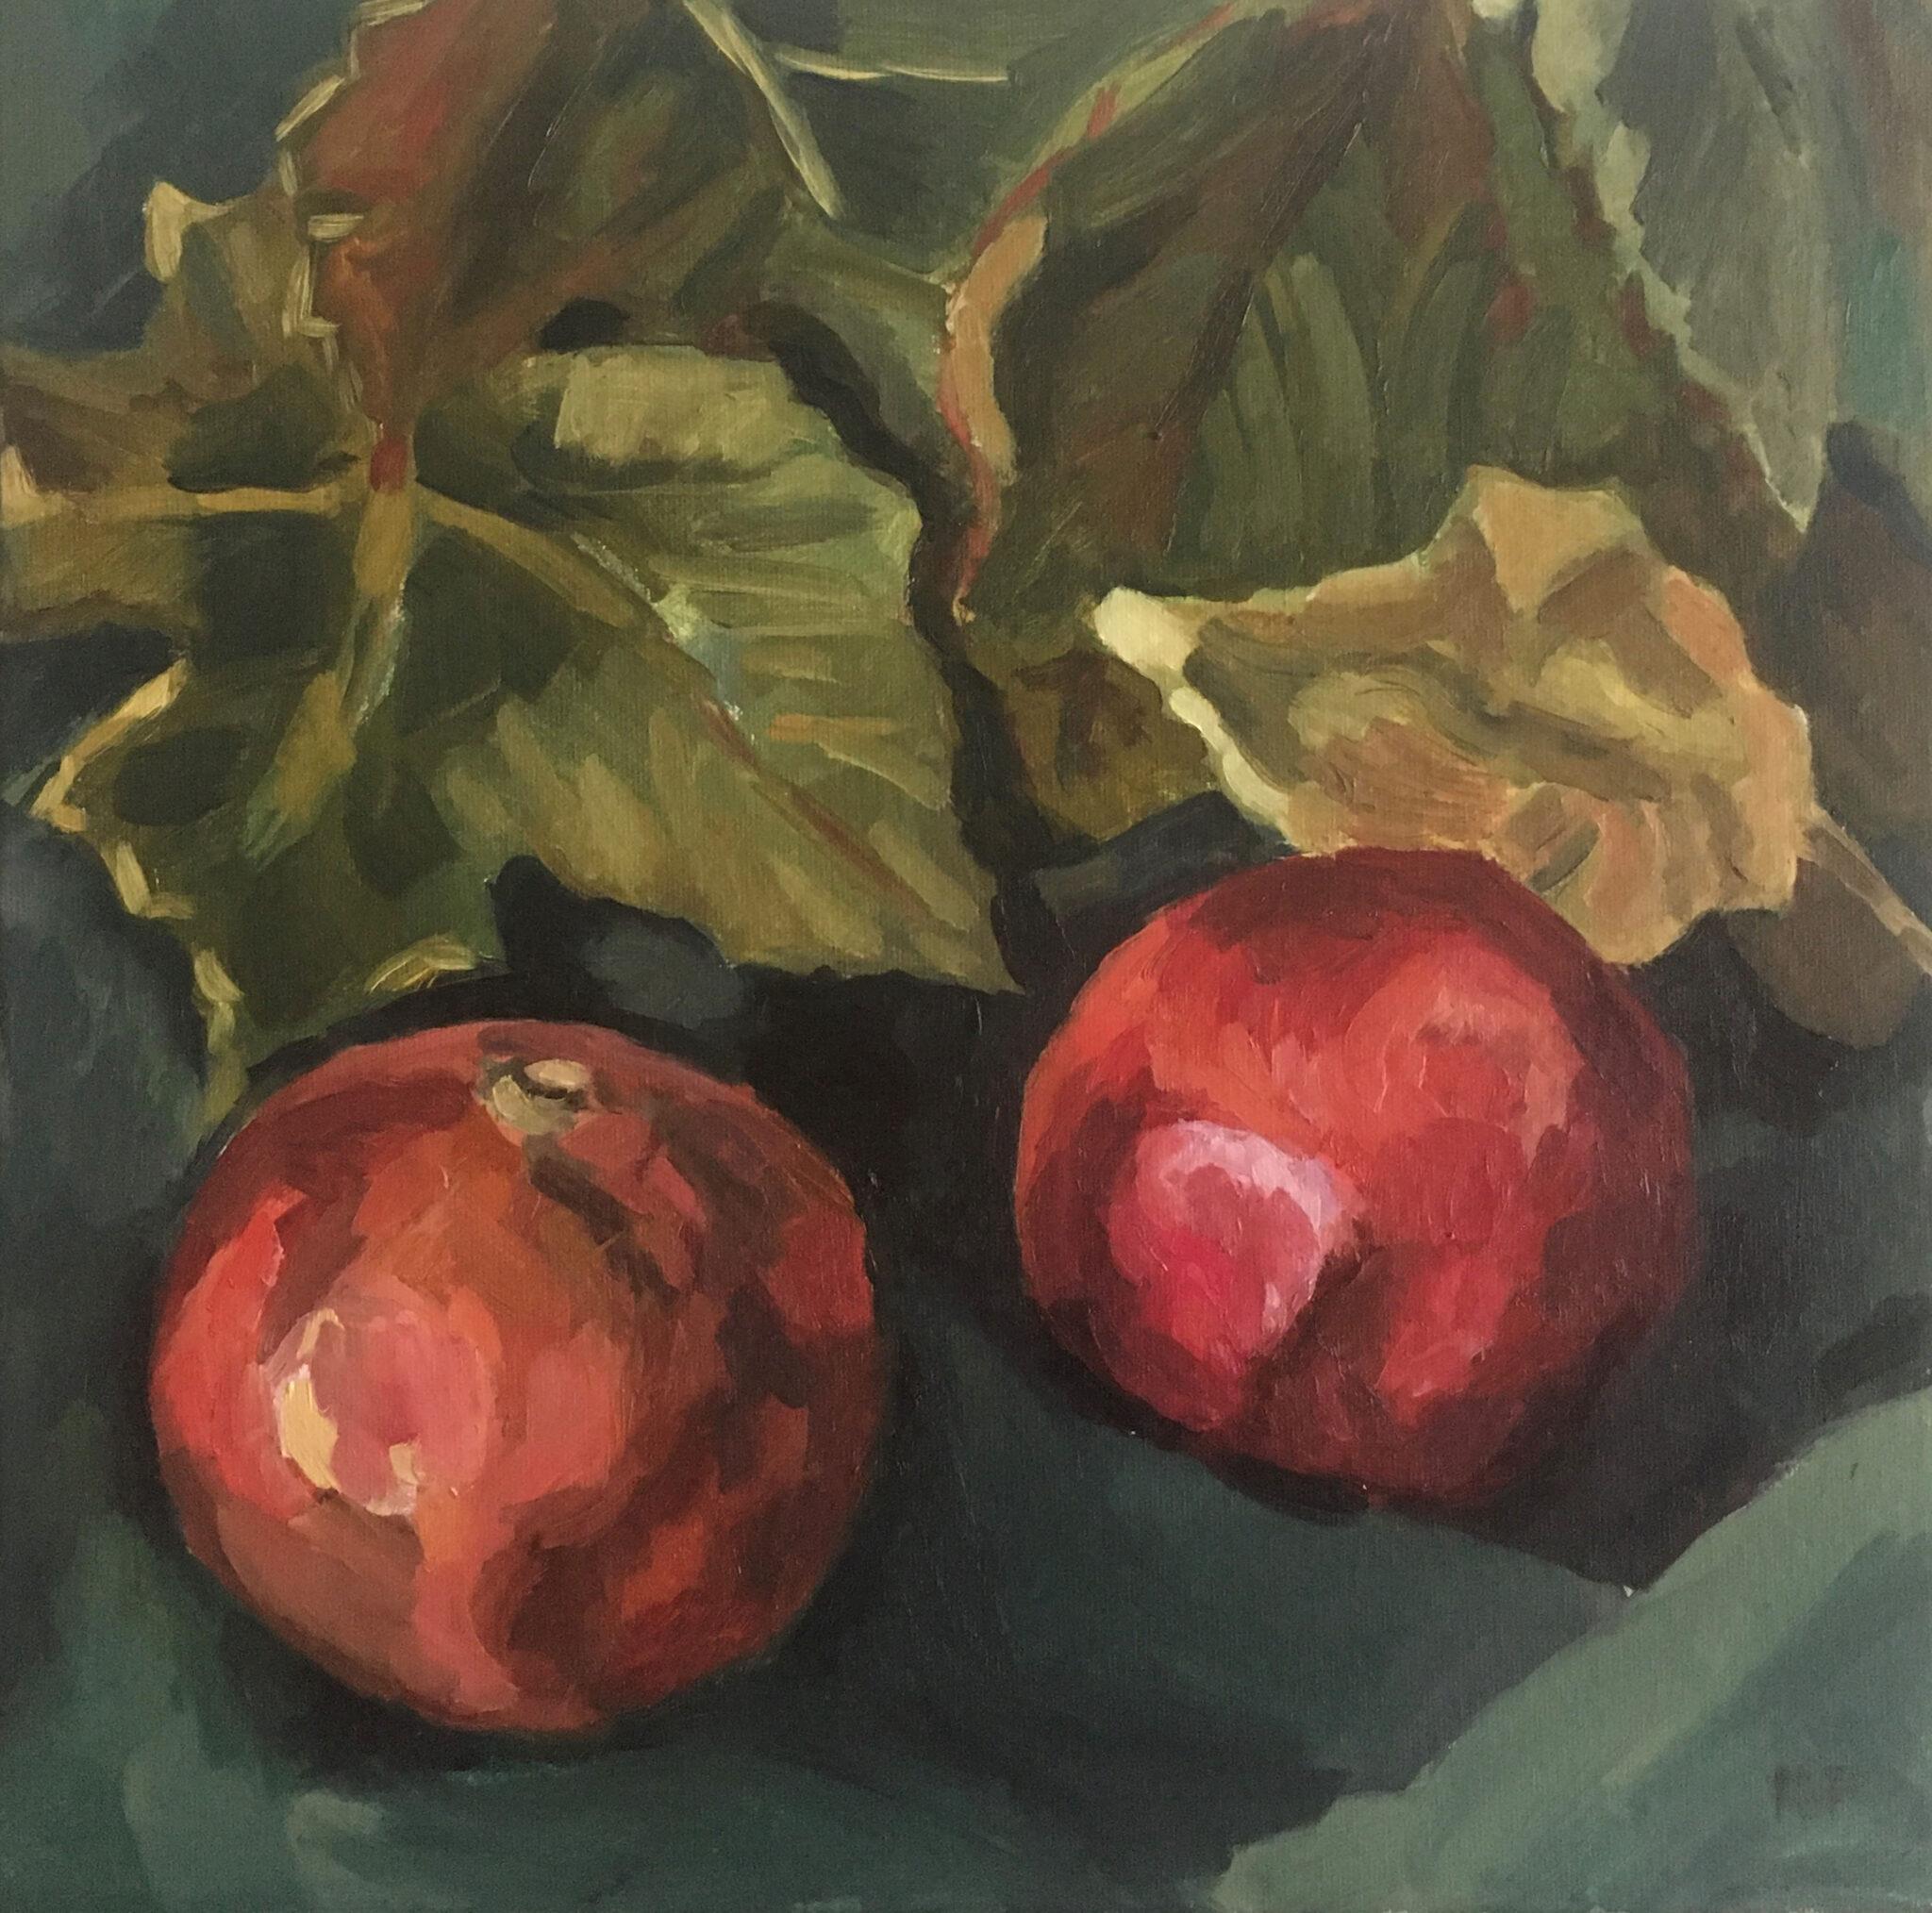 Pomegranates and autumn leaves